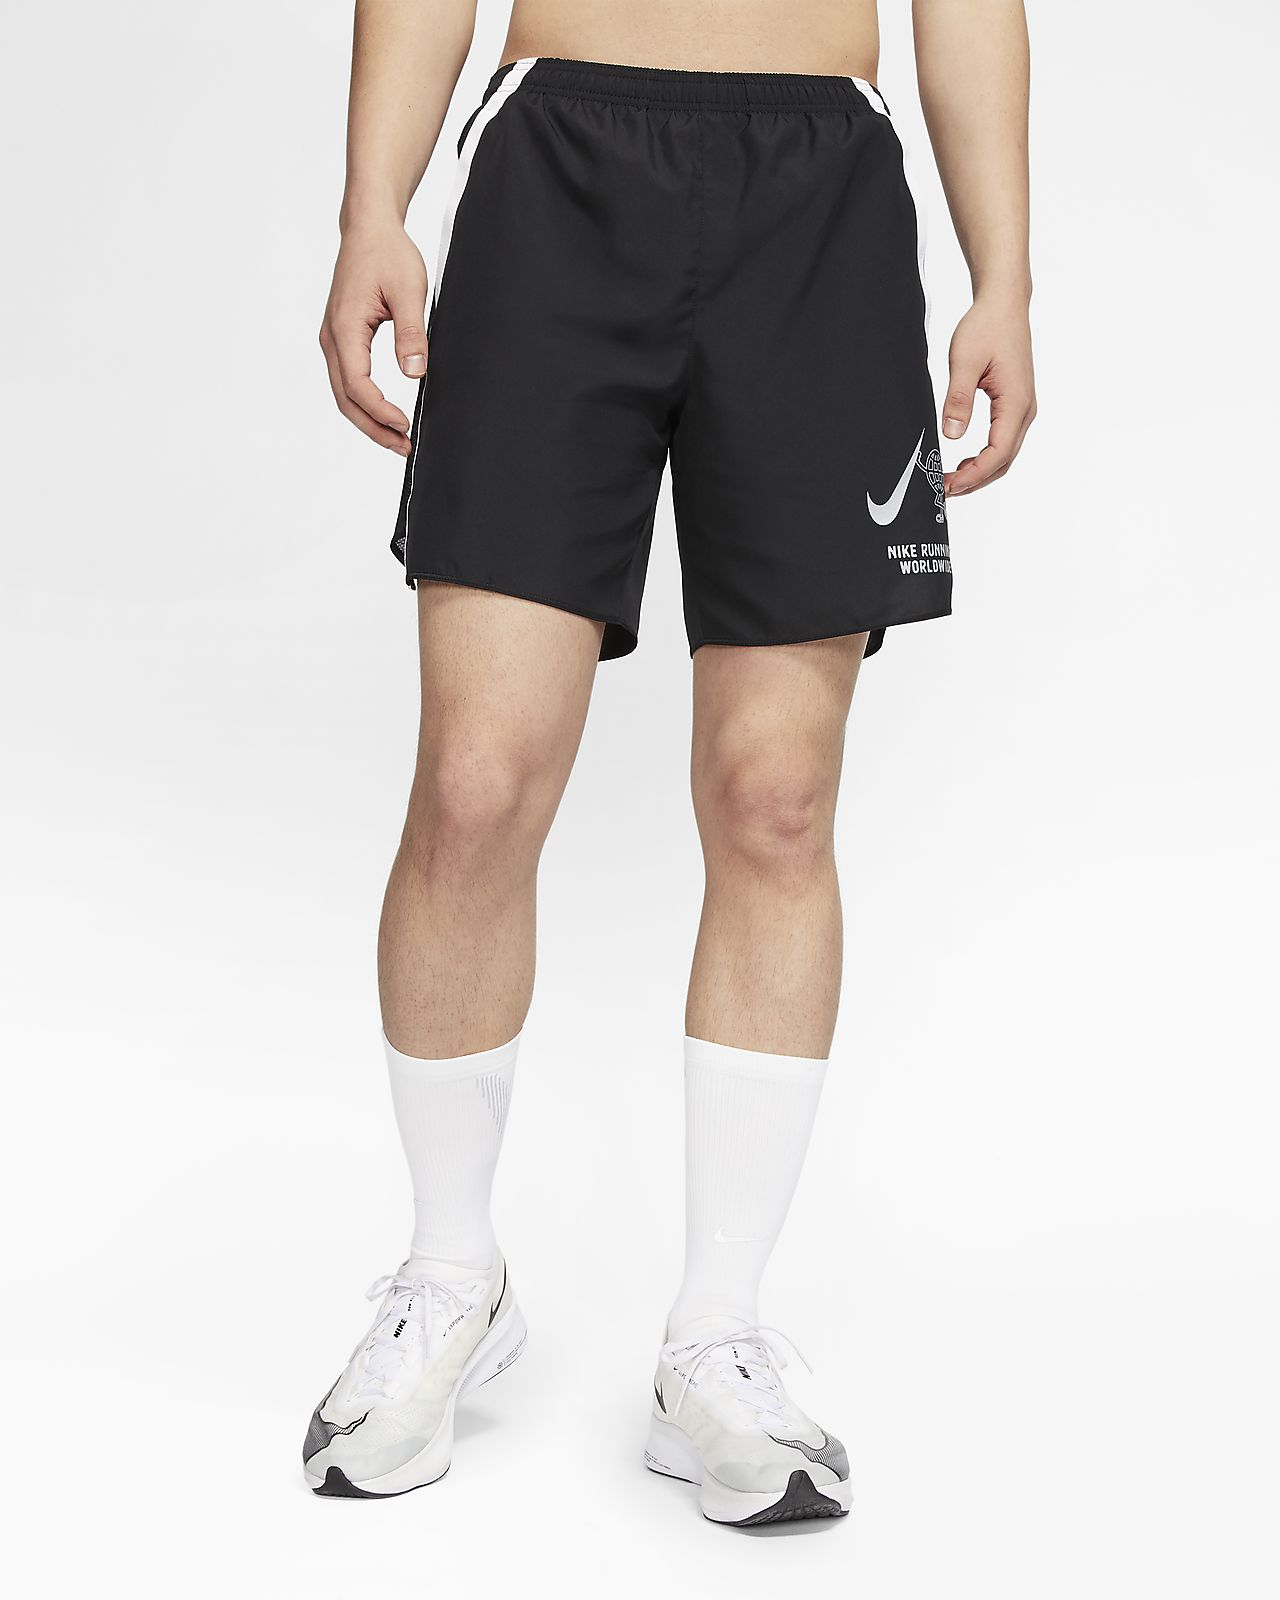 "Nike Challenger Wild Run 男款 7"" 襯裡跑步短褲"